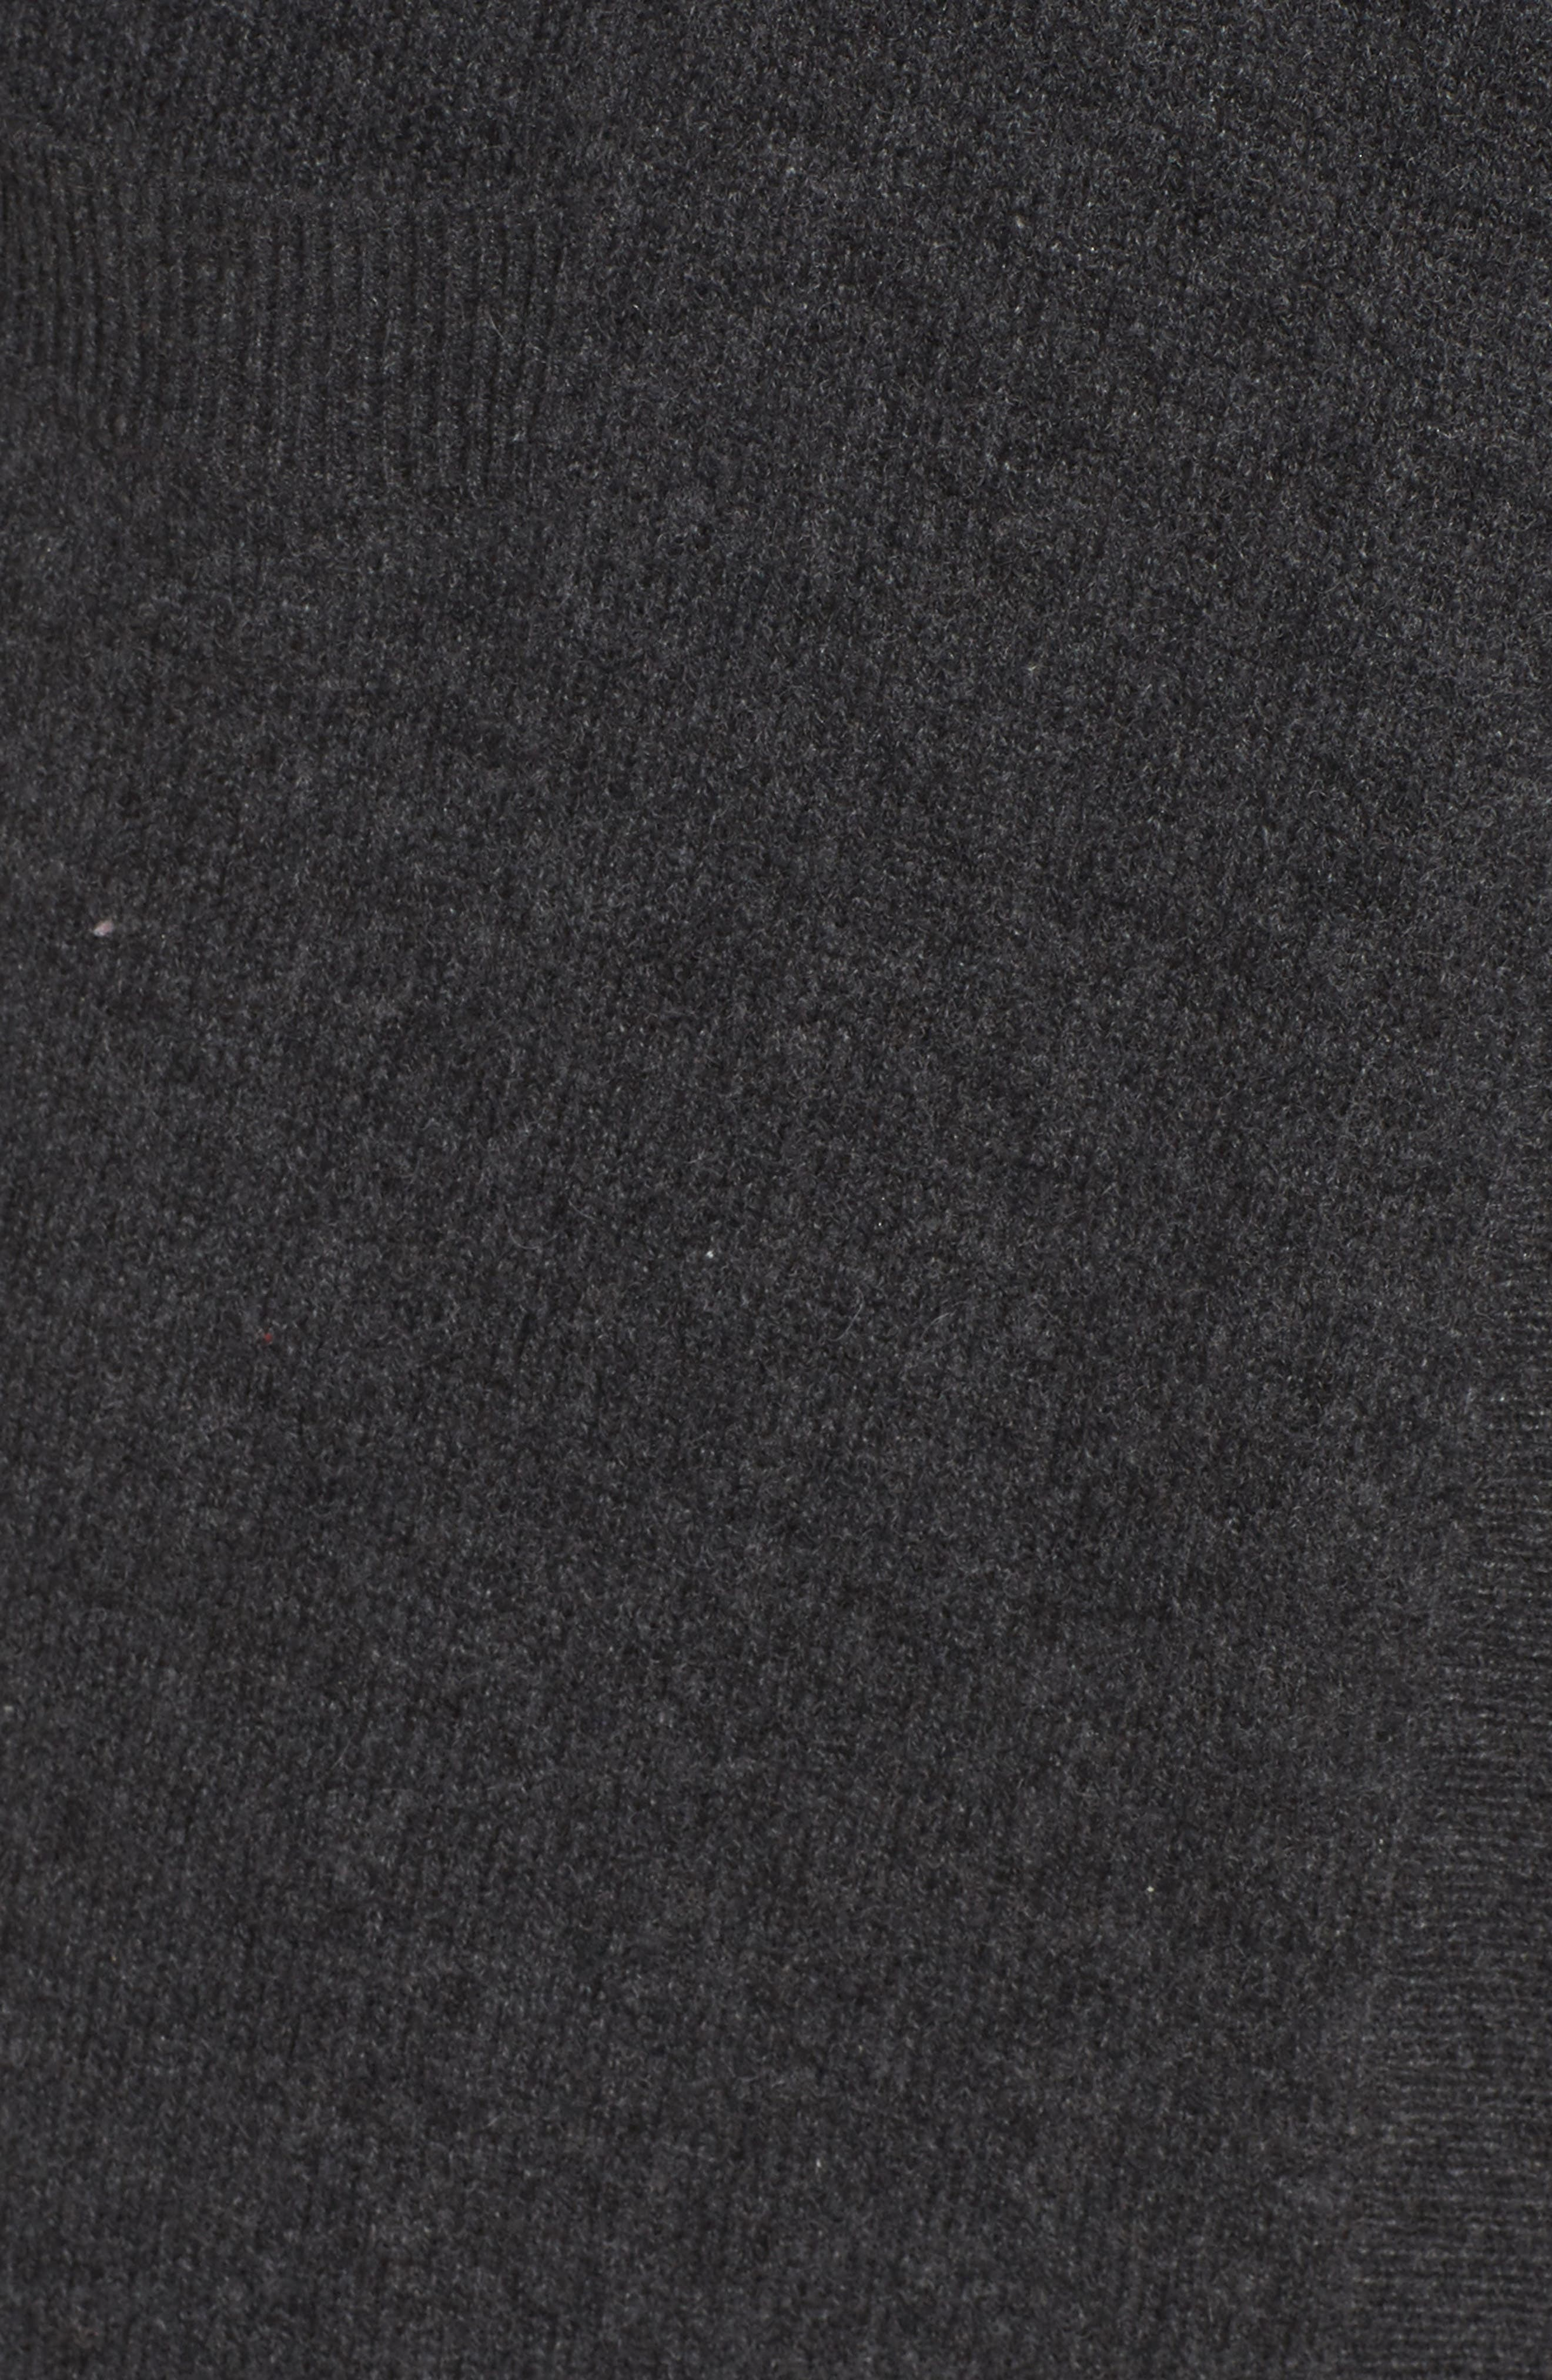 Cashmere Robe,                             Alternate thumbnail 6, color,                             Charcoal